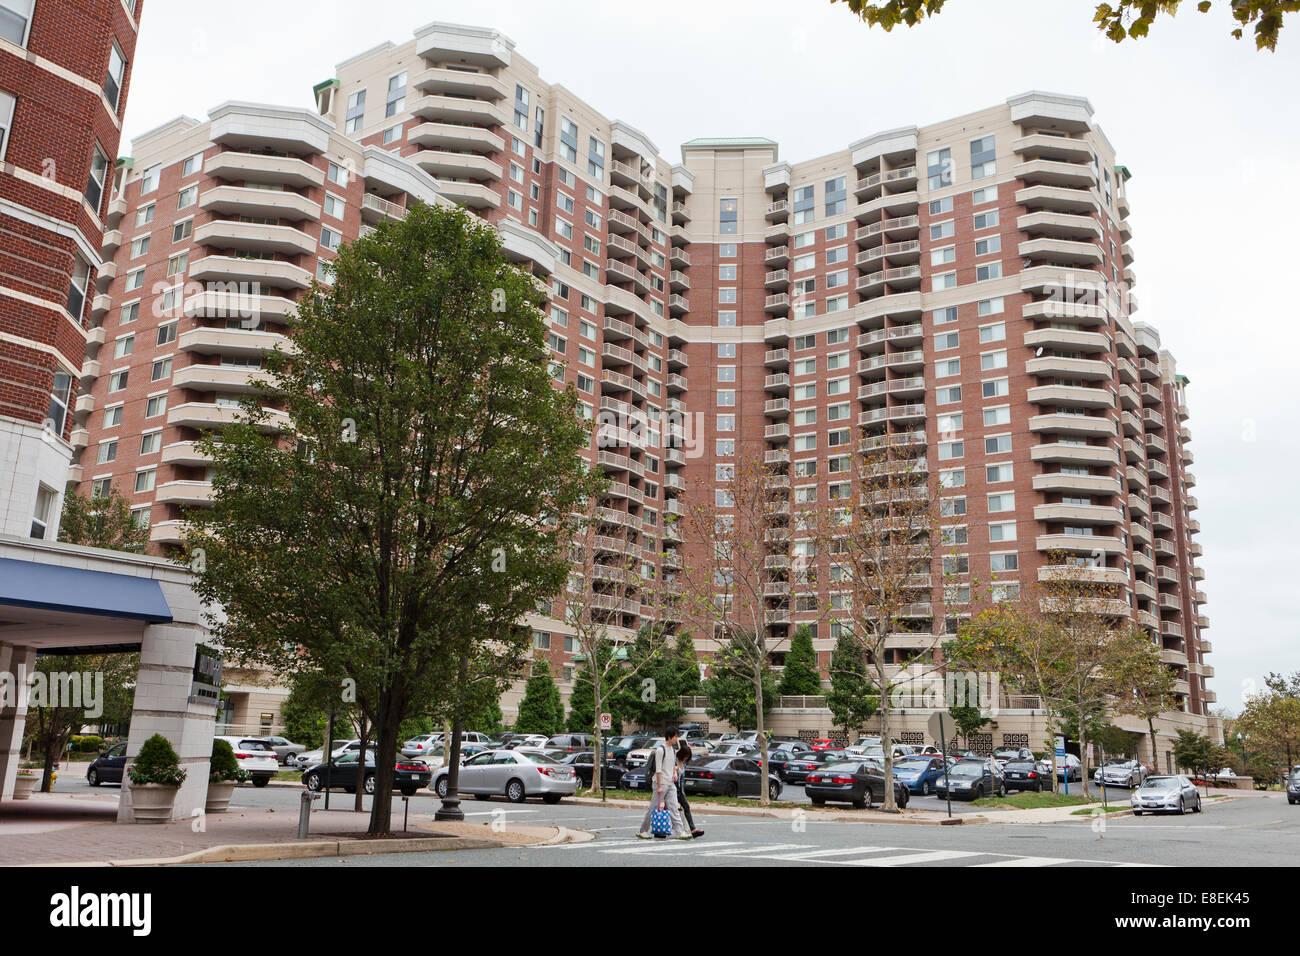 High-Rise Eigentumswohnung Gebäude - Ballston Nachbarschaft, Arlington, Virginia, Vereinigte Staaten Stockbild